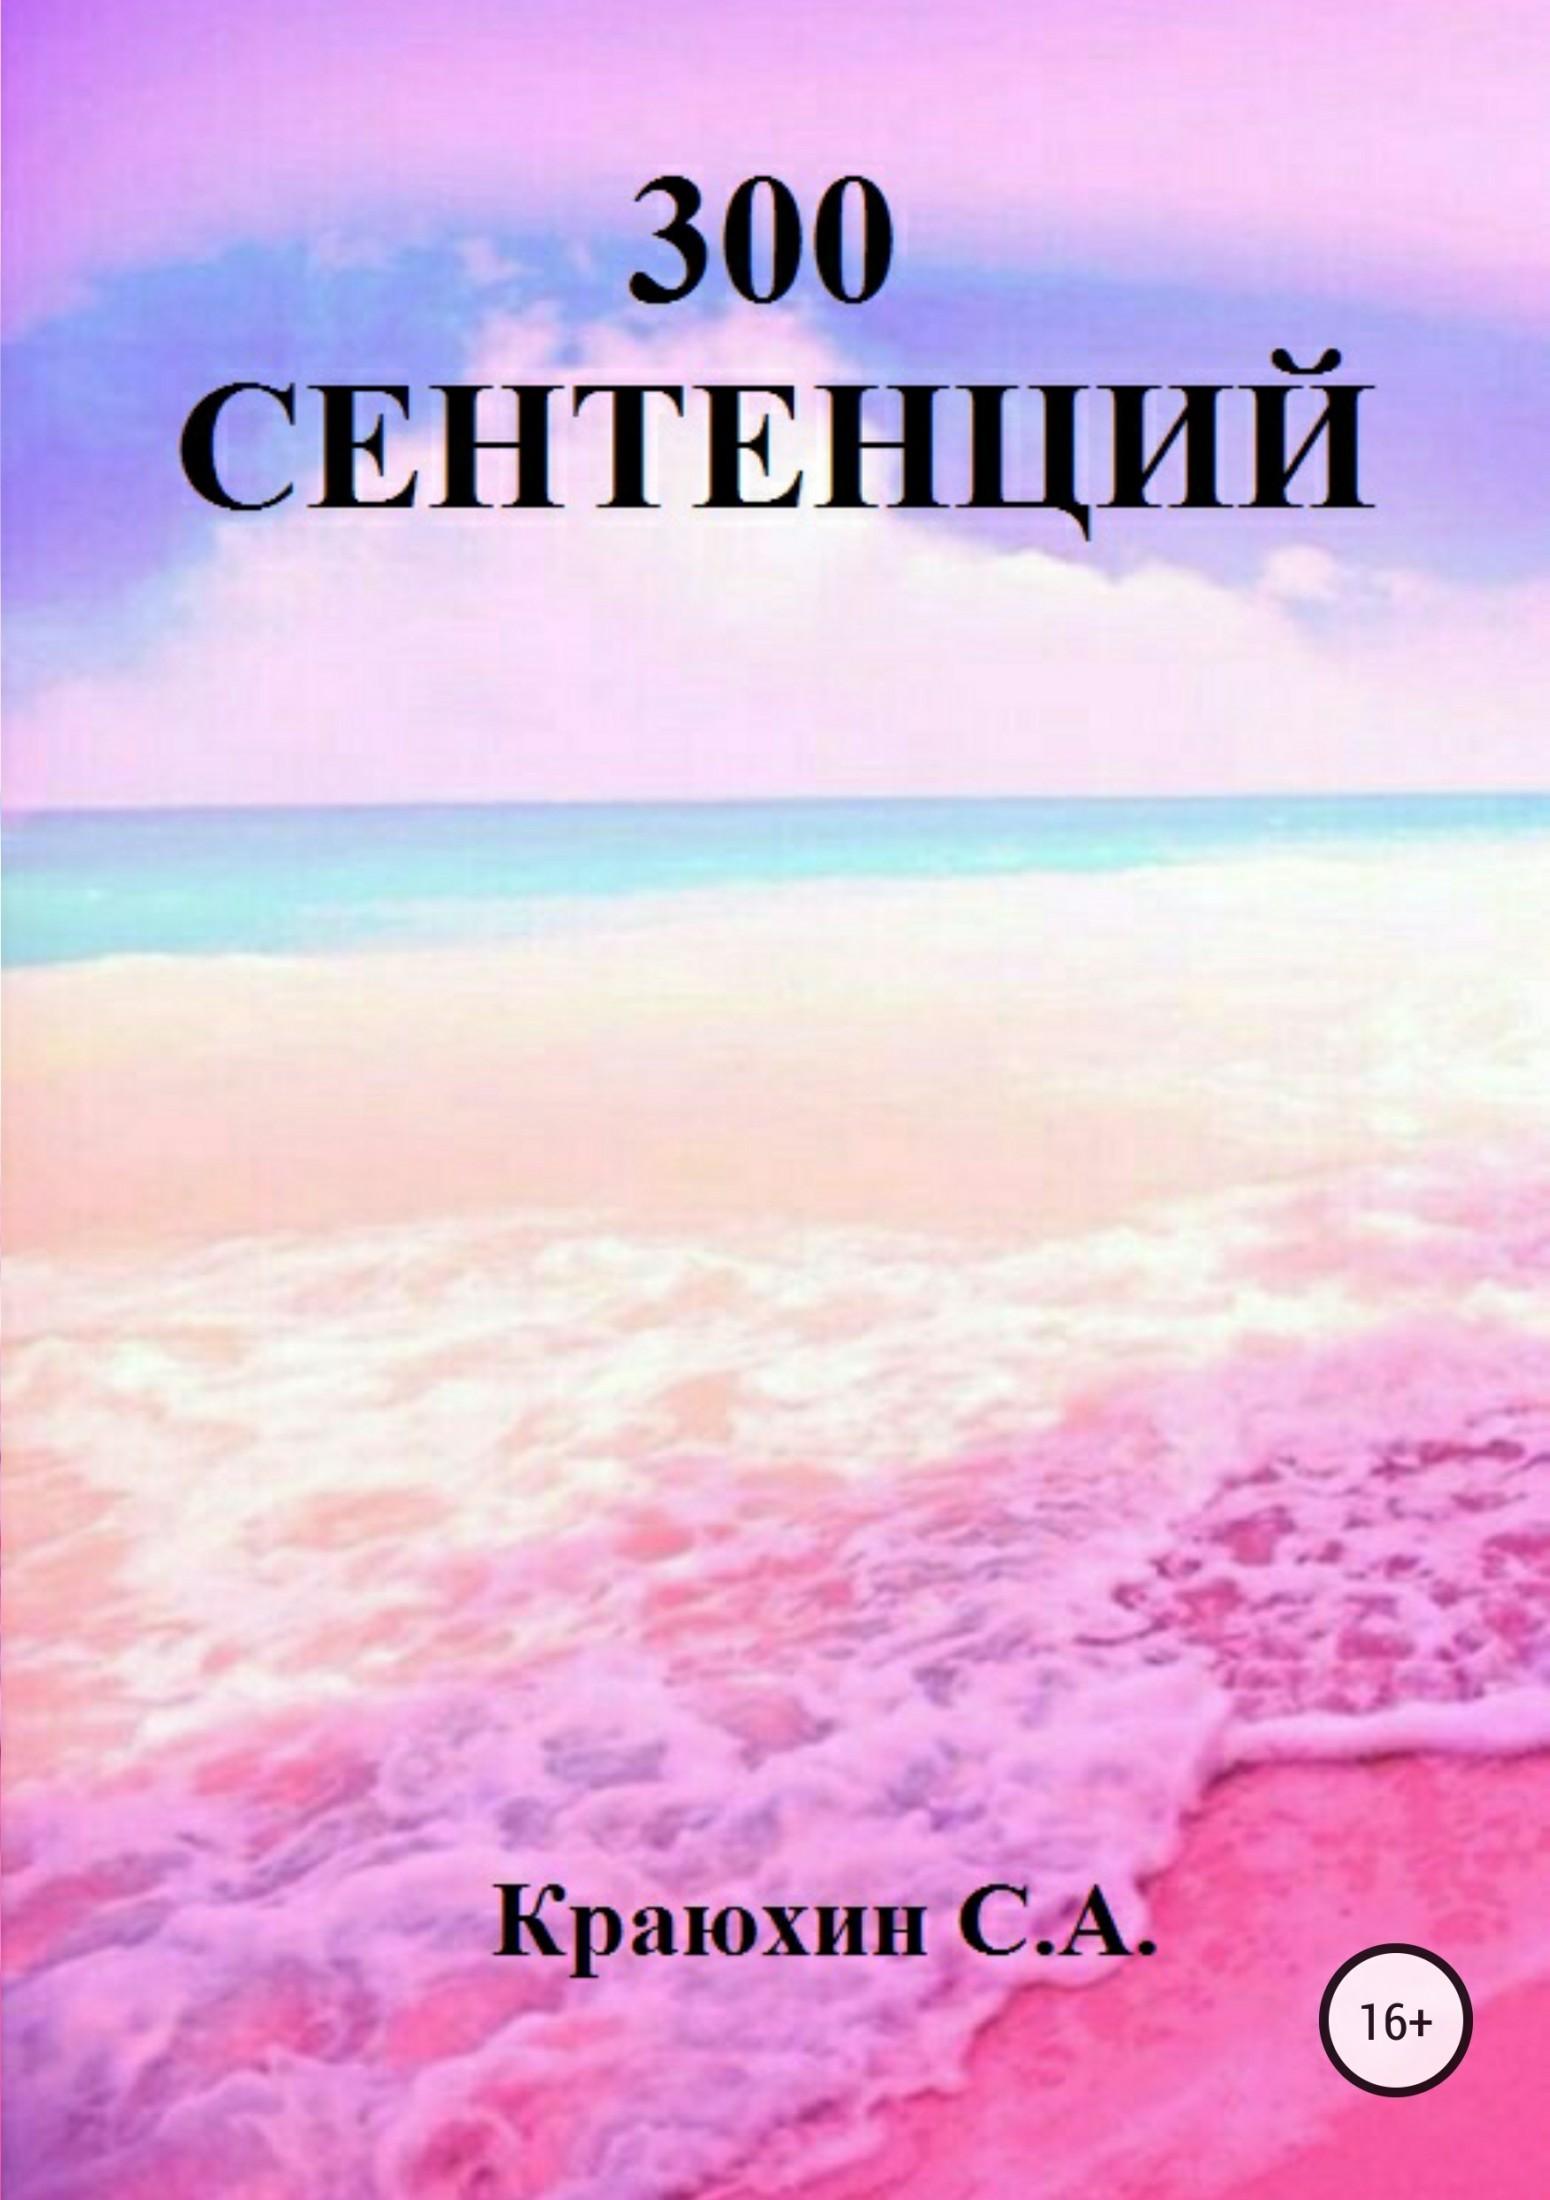 Сергей Александрович Краюхин 300 сентенций сергей александрович краюхин крайняя поэзия